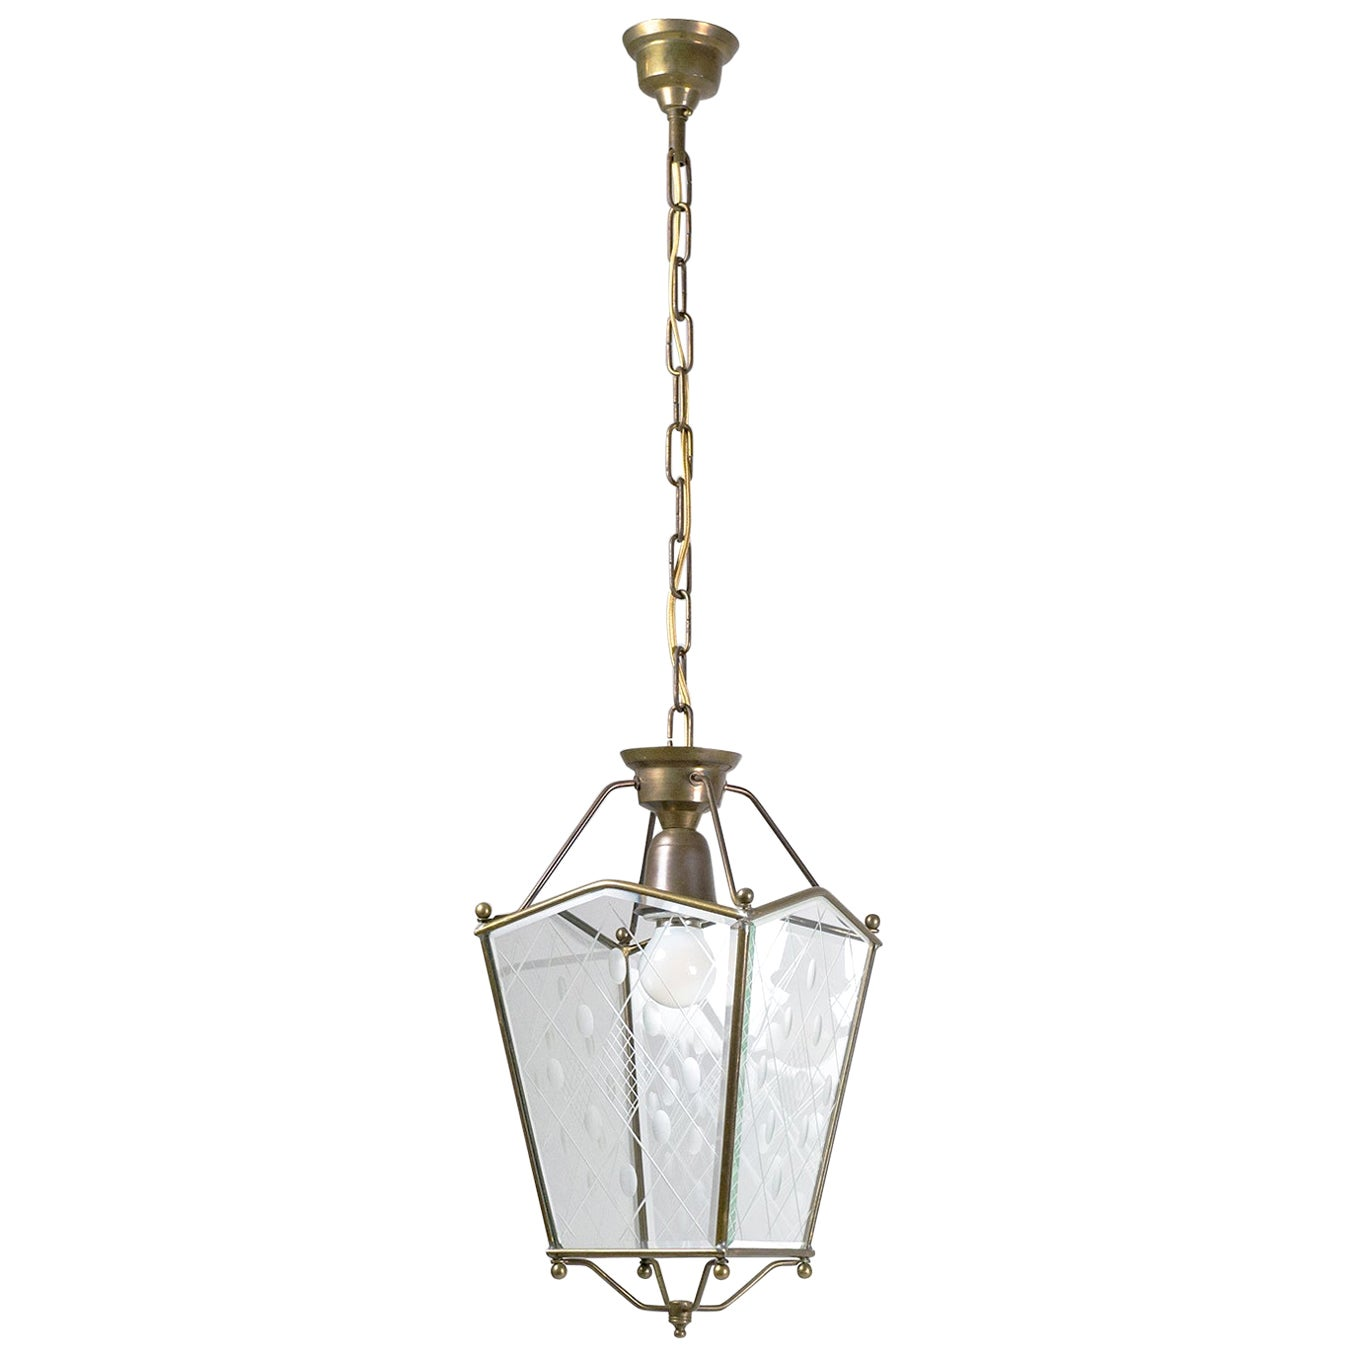 Italian 1940s Cut Glass Lantern